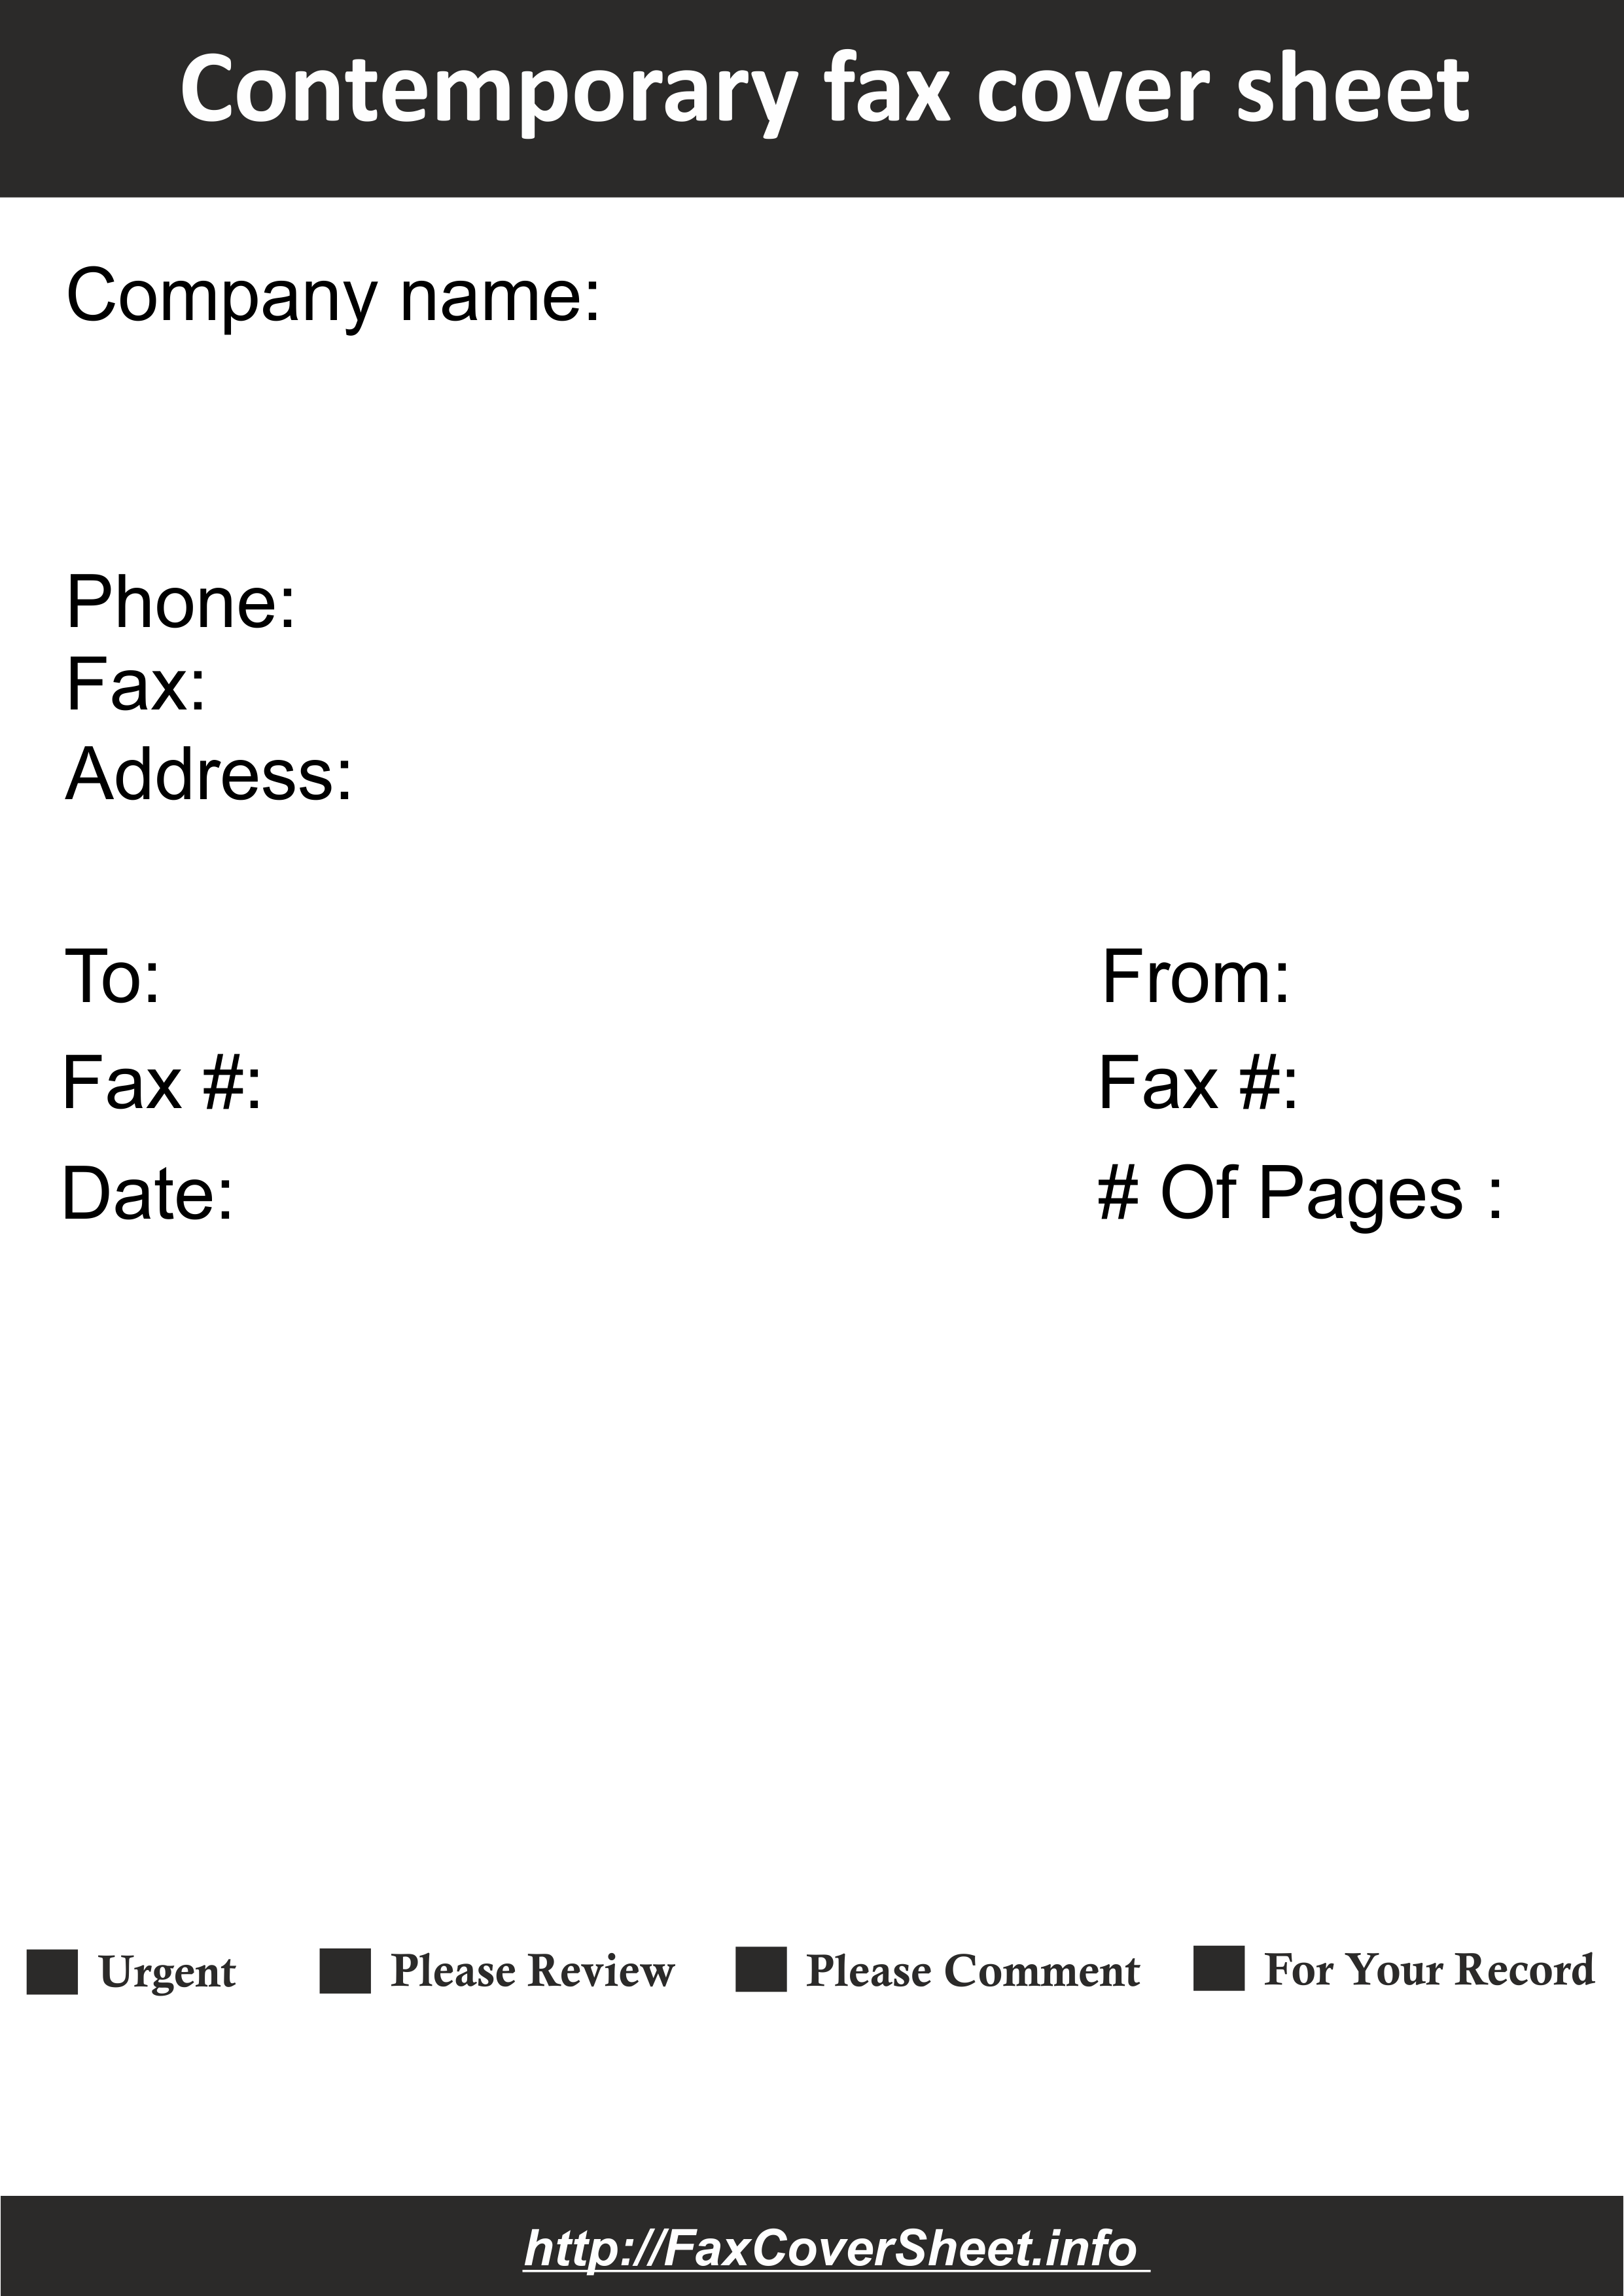 Contemporary Design Fax Cover Sheet Template